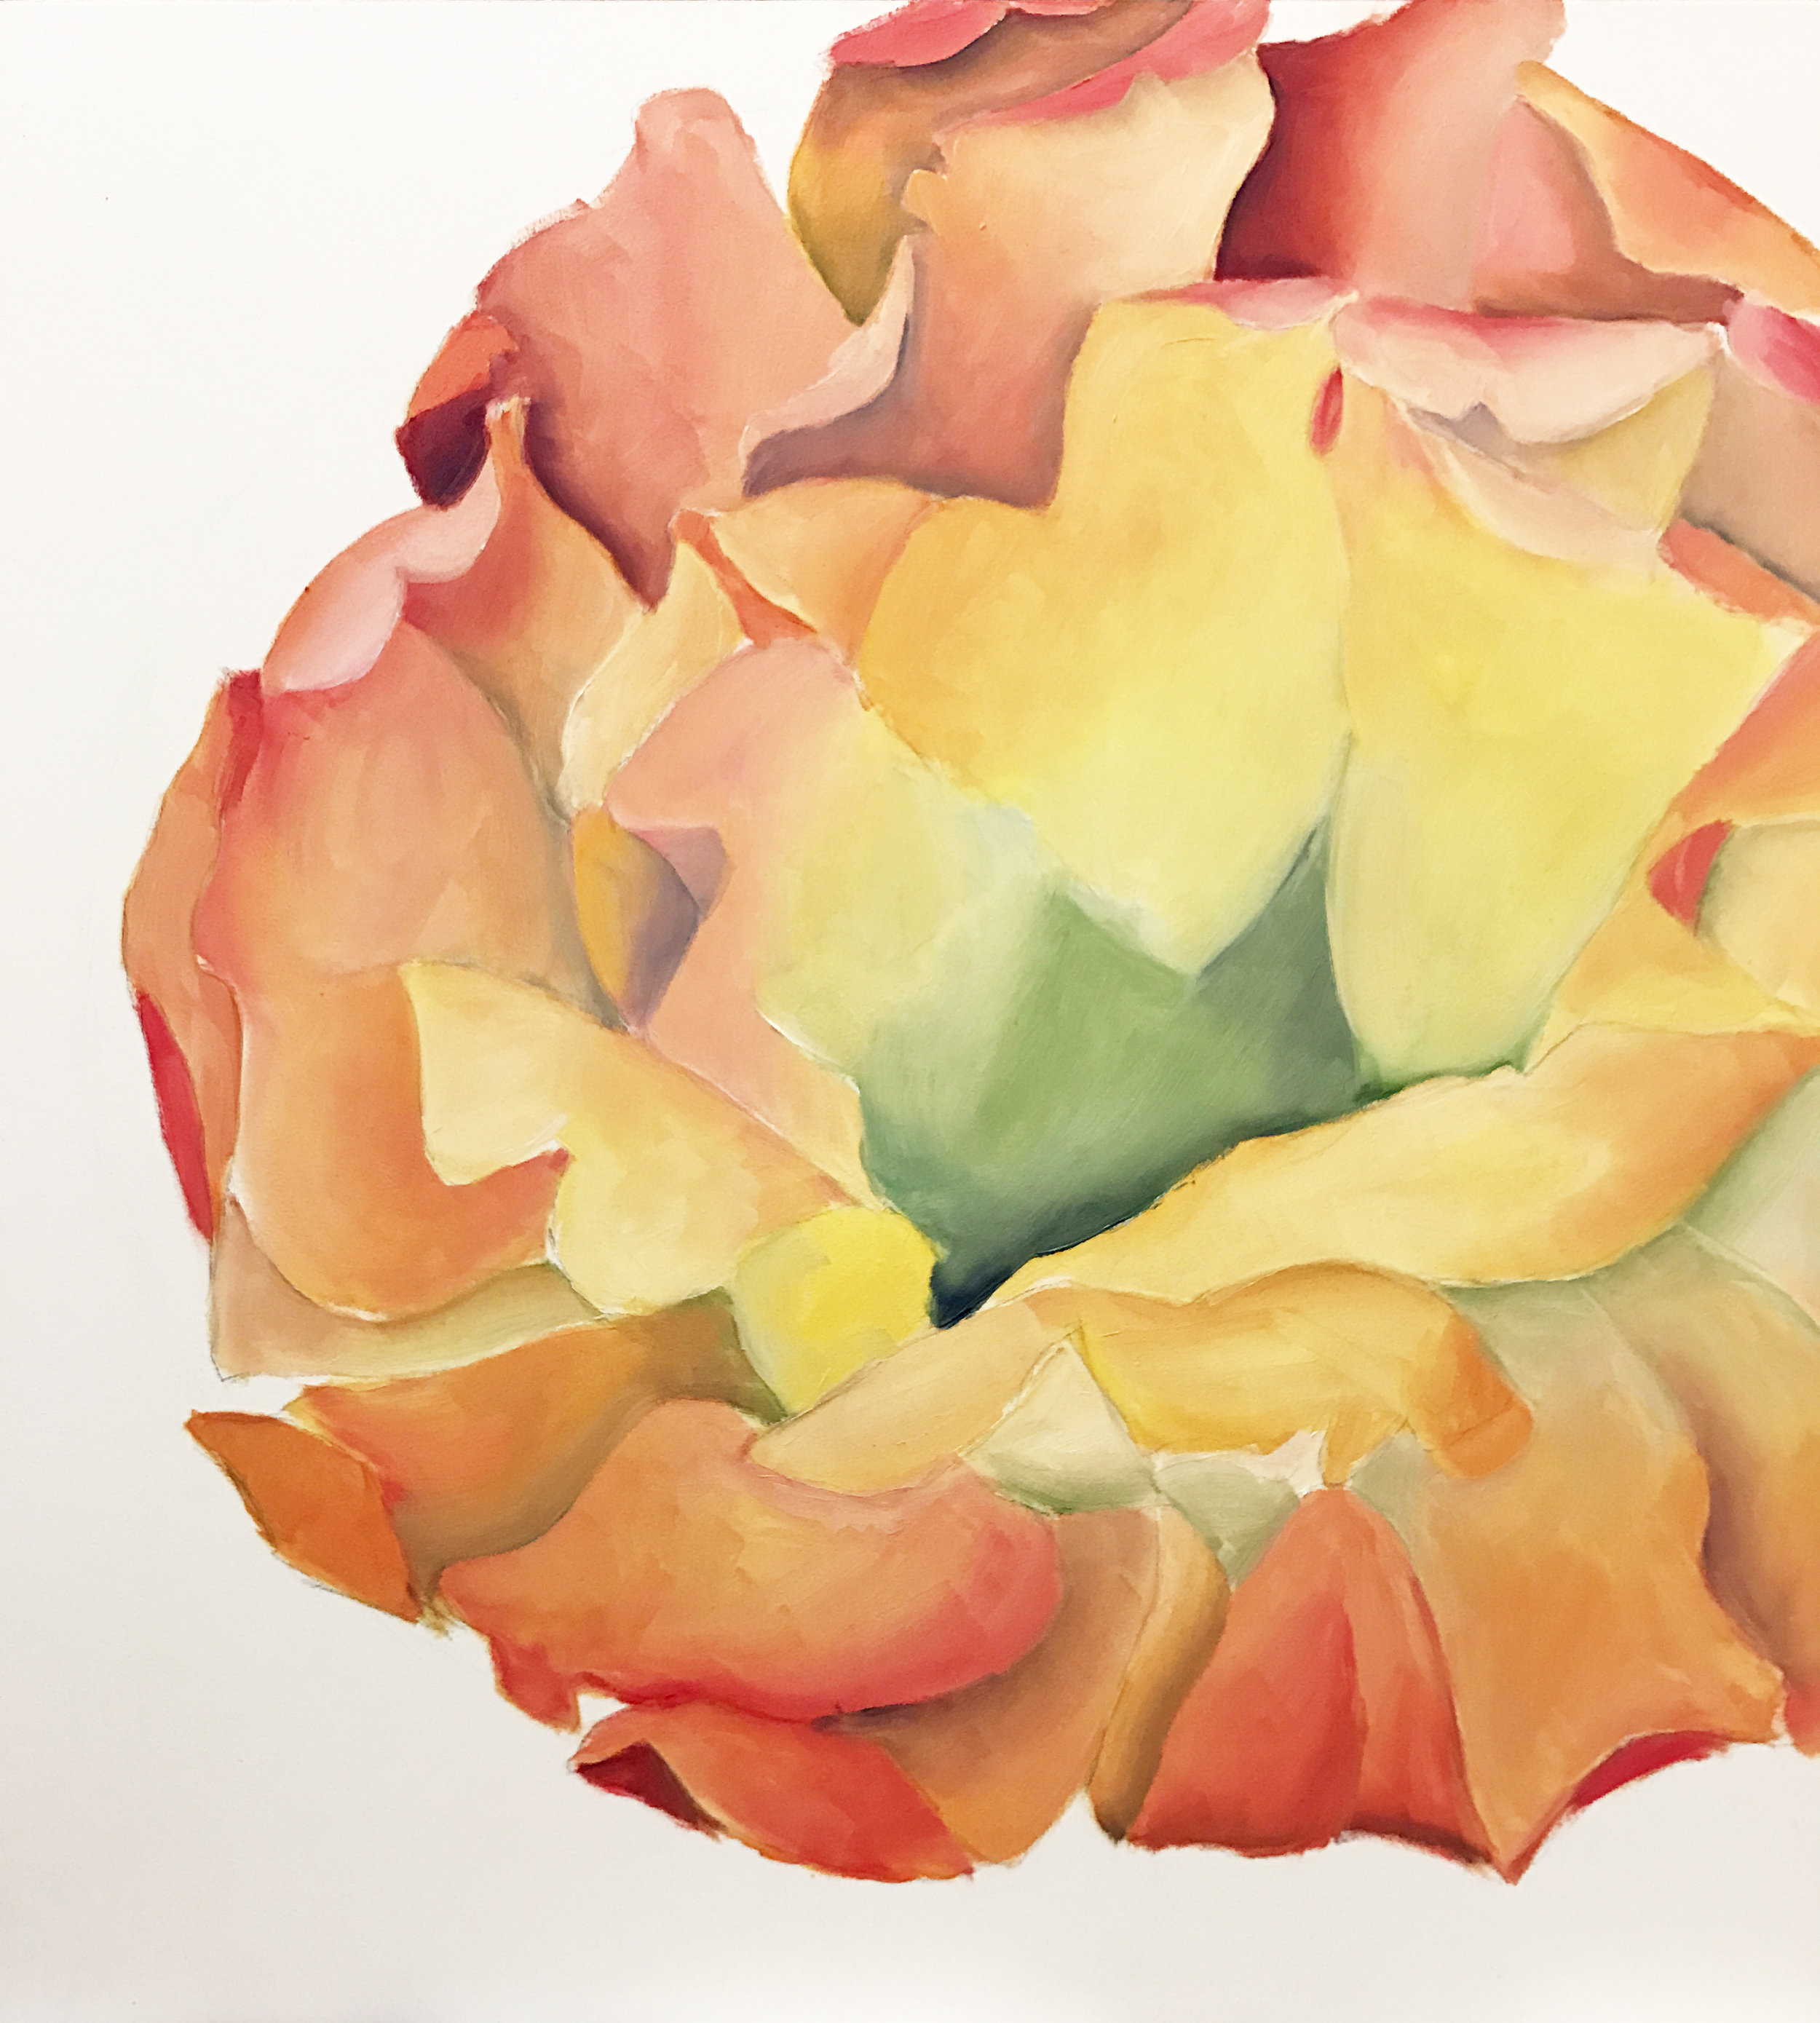 WIP Cactus Flower Original Oil Painting